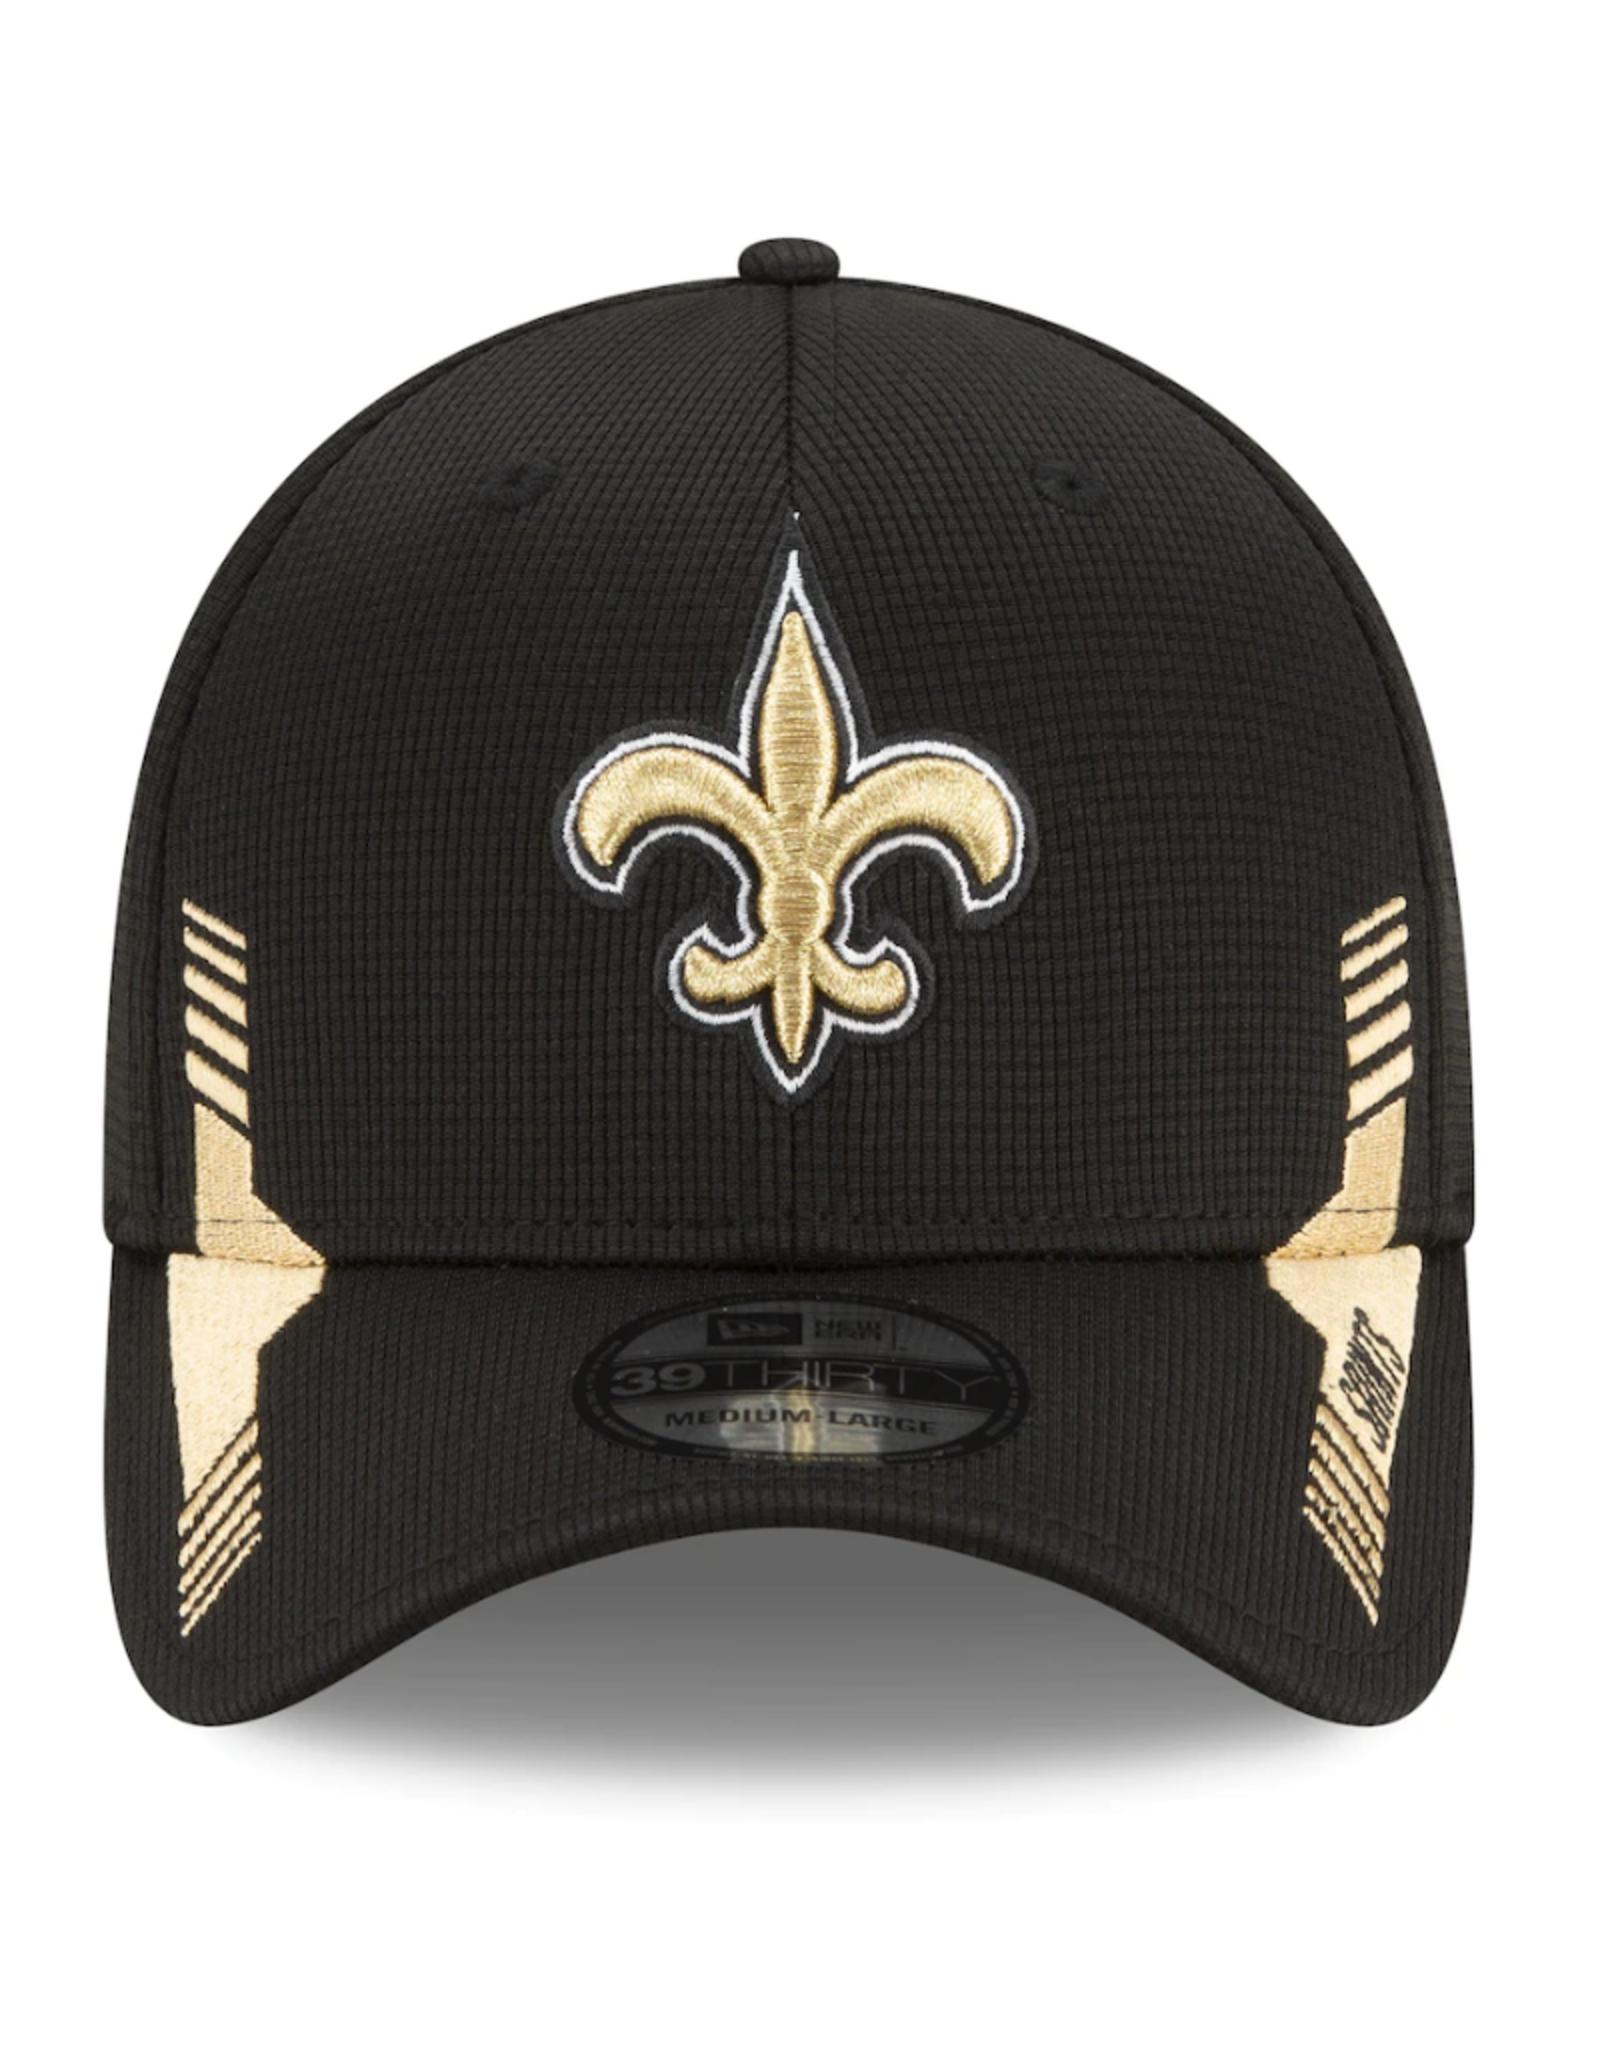 New Era Men's '21 39THIRTY Sideline Home Hat New Orleans Saints Black